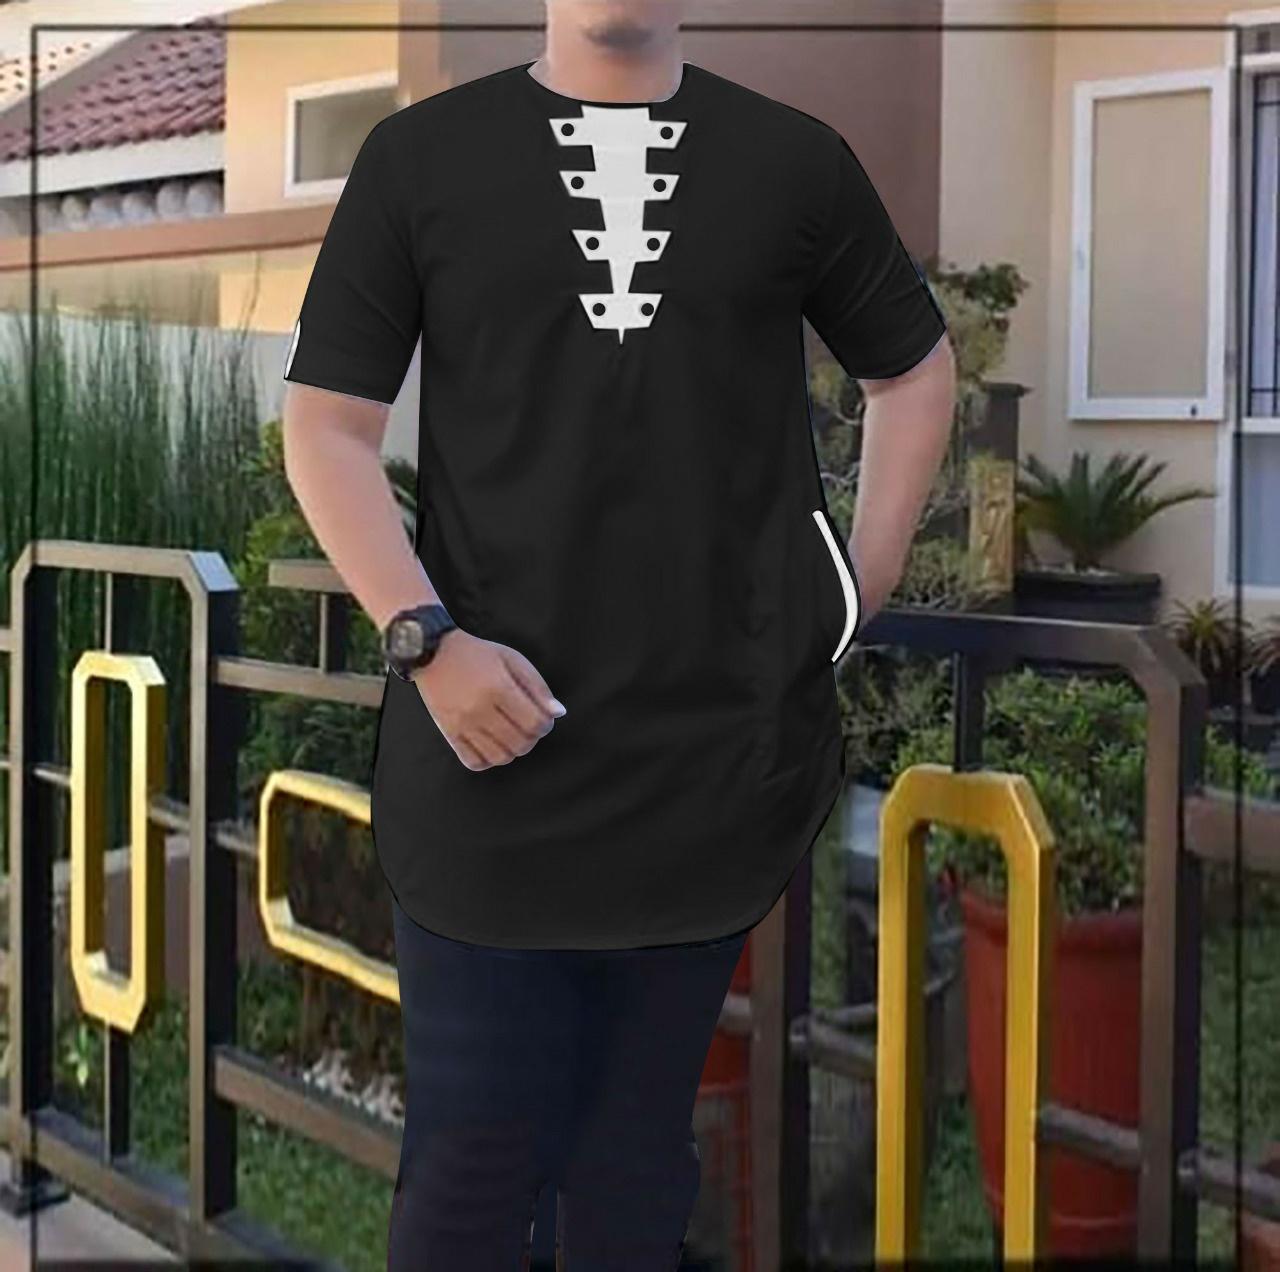 cod/baju koko pria dony/koko panjang/kokopriadewasa/bajukokomuslim